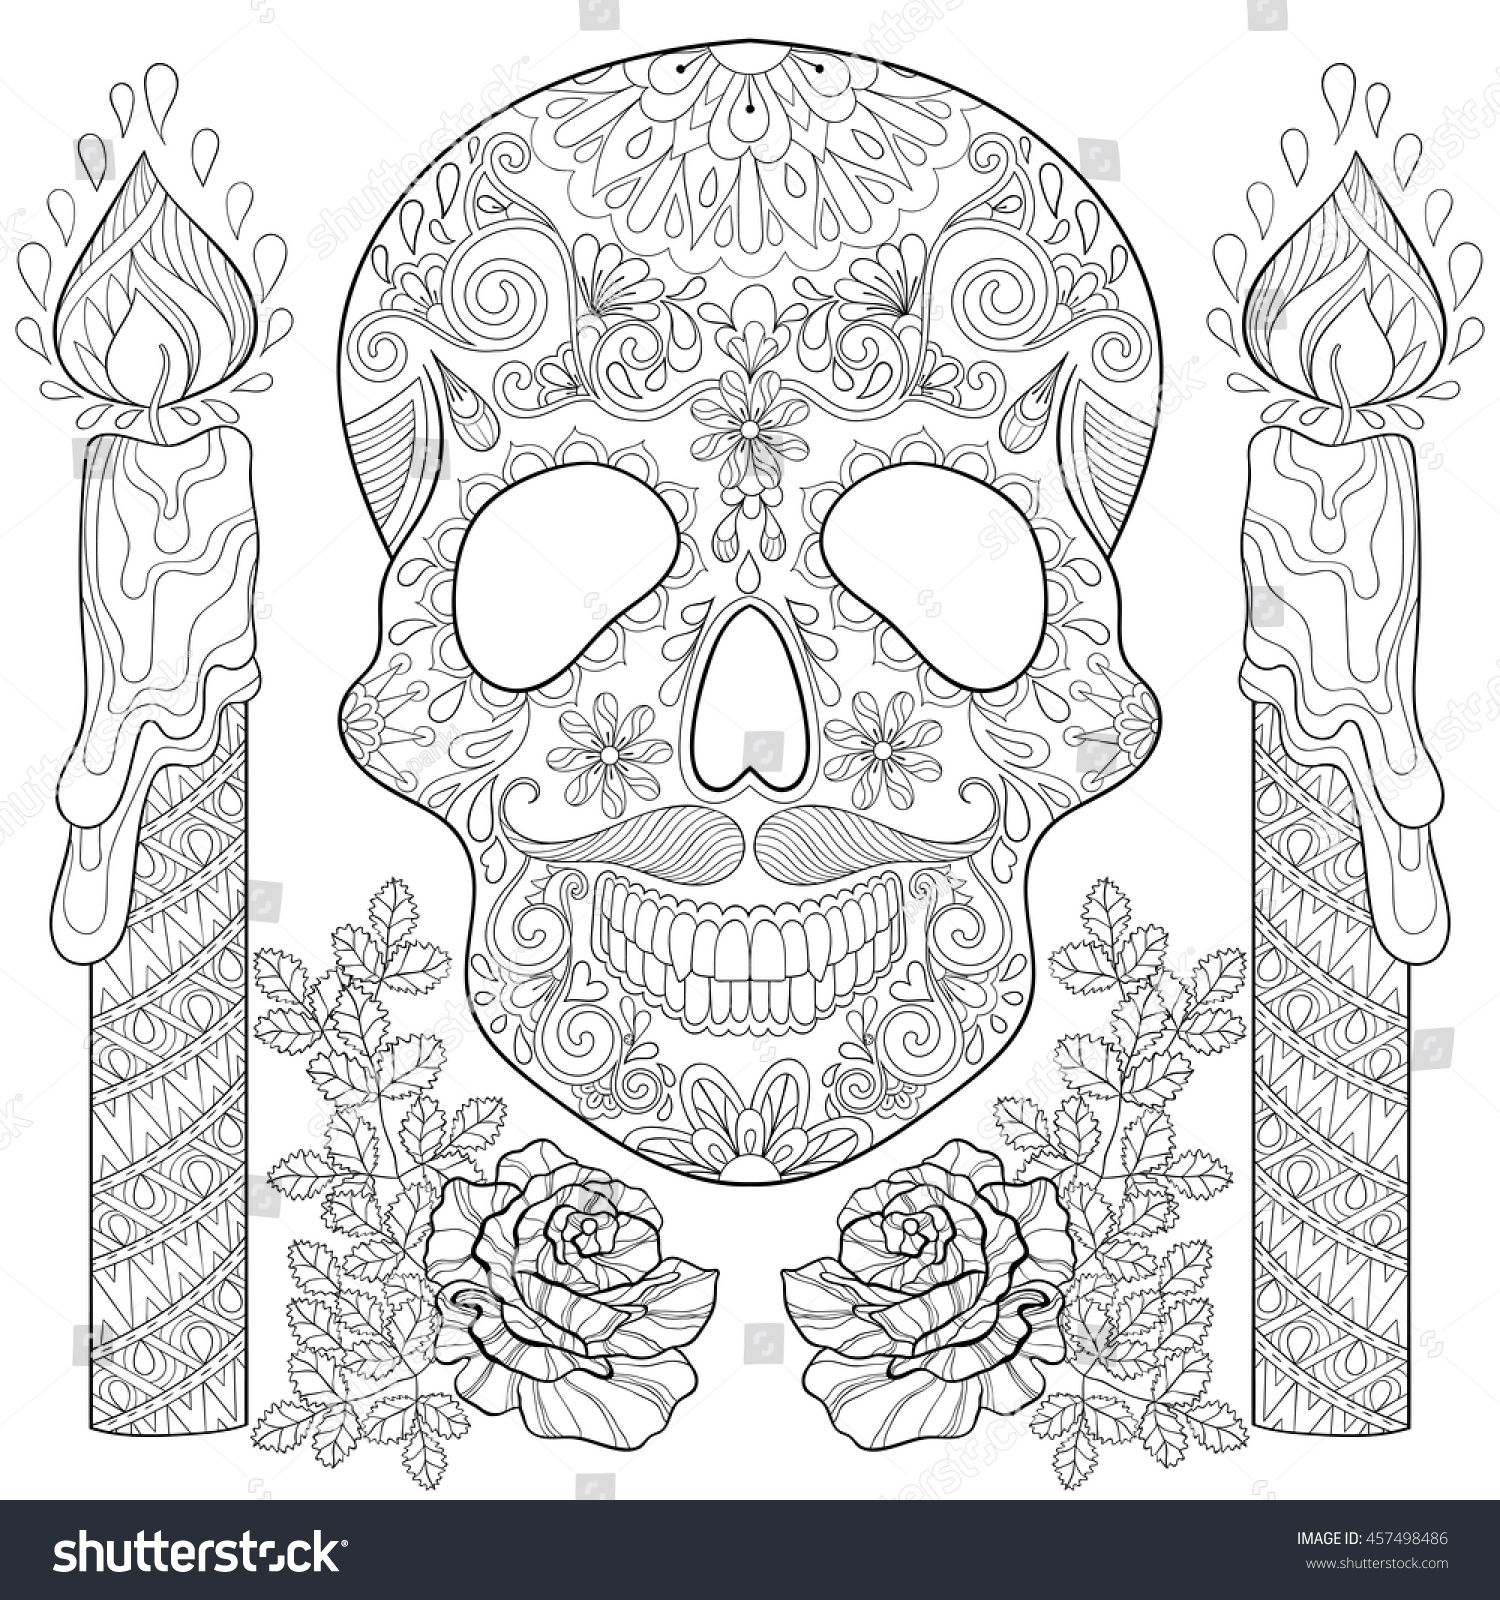 zentangle stylized skull candles roses halloween stock vector